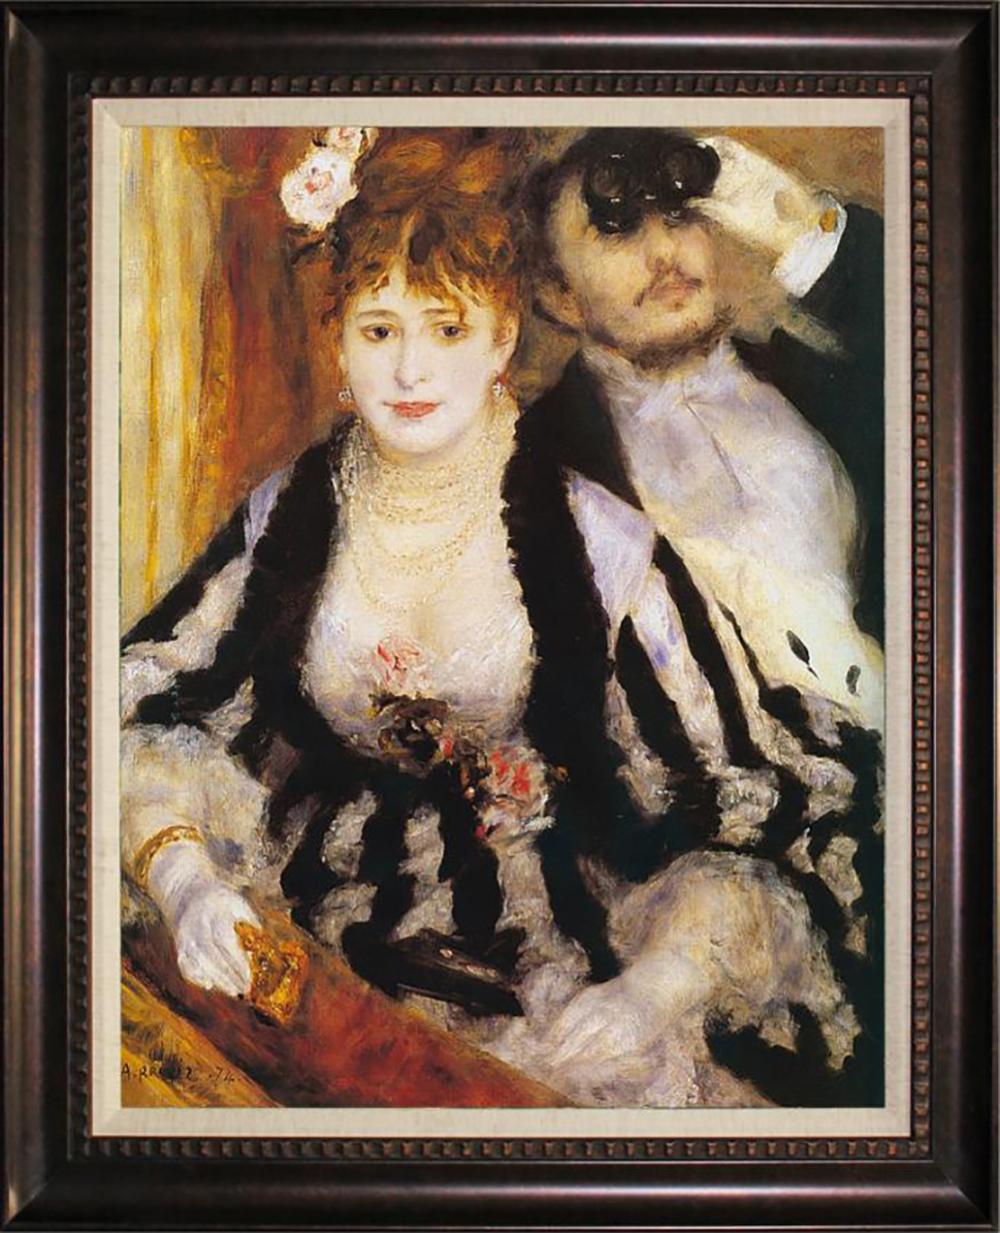 After Pierre Auguste Renoir, La Loge